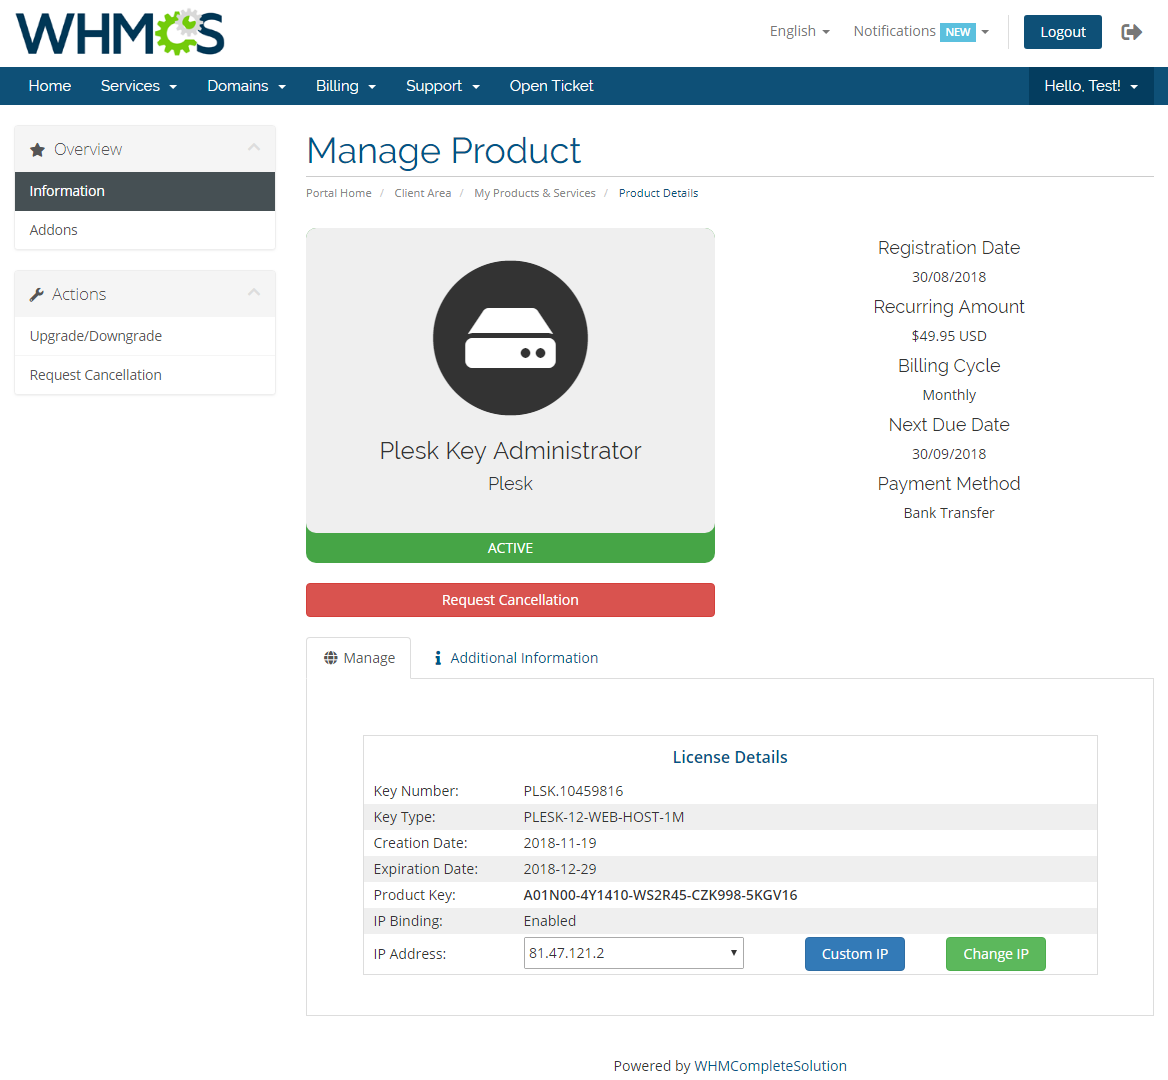 Plesk Key Administrator For WHMCS: Module Screenshot 1